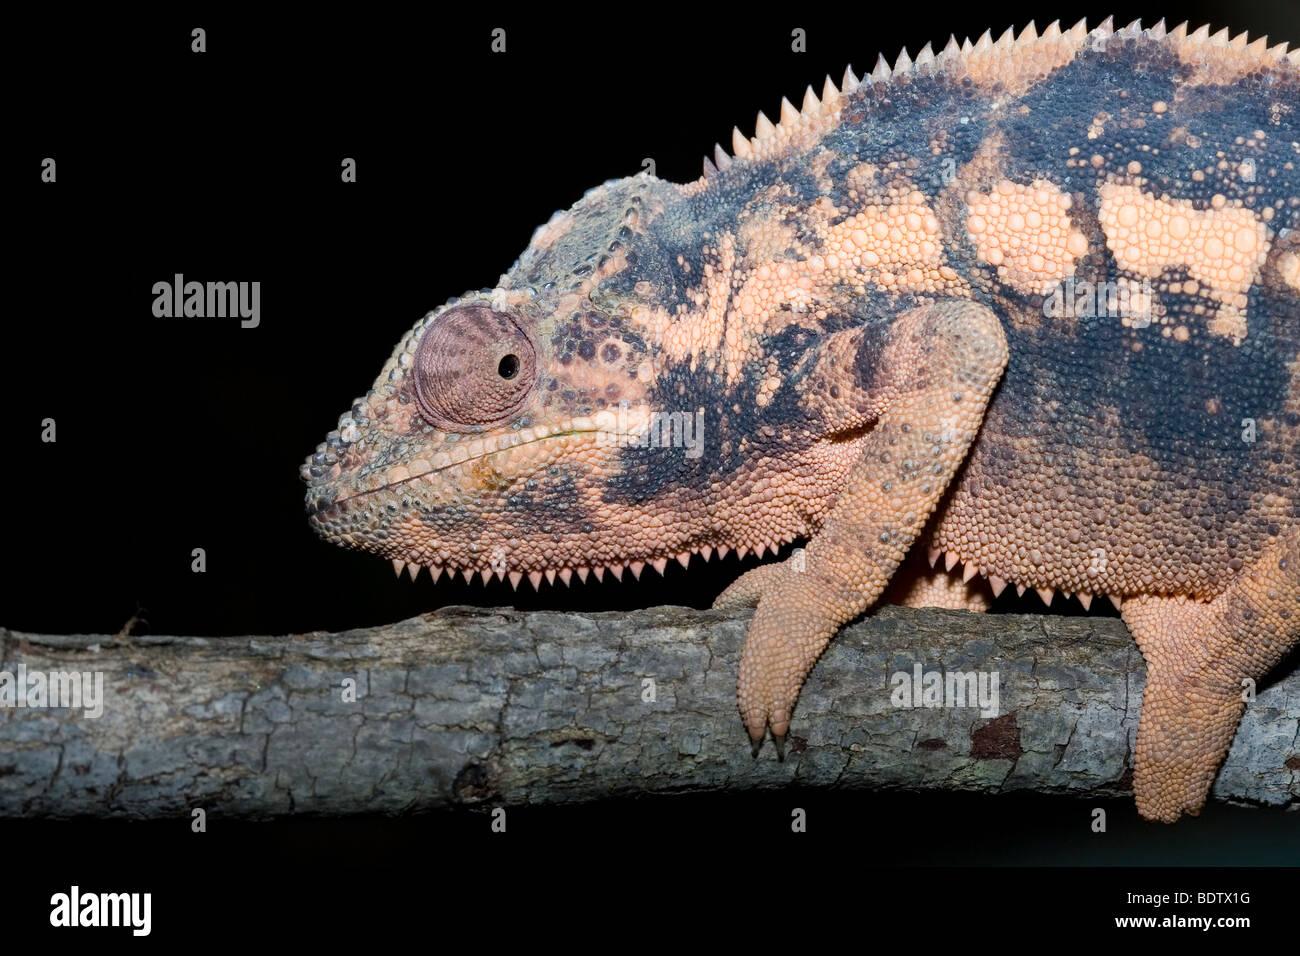 Pantherchamaeleon, weibchen, weiblich, female, Furcifer pardalis, panther chameleon, madagascar, africa, Madagaskar, - Stock Image